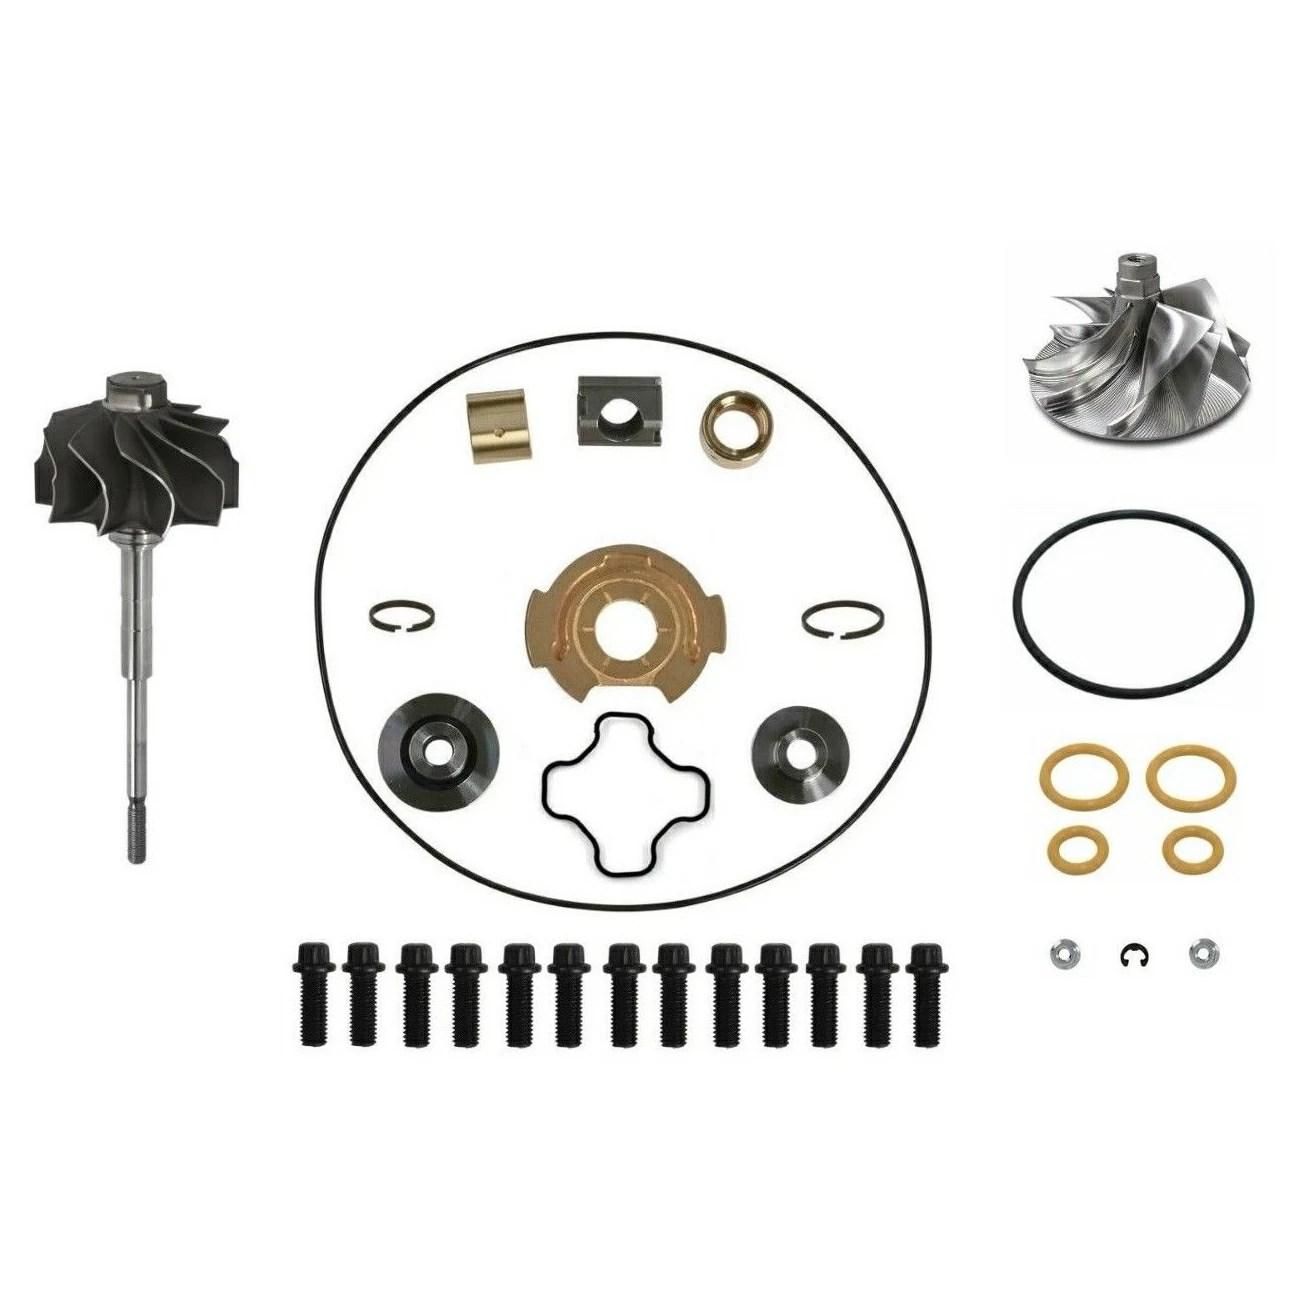 Spoologic Gtp38 Turbo Rebuild Kit Billet Wheel Shaft For